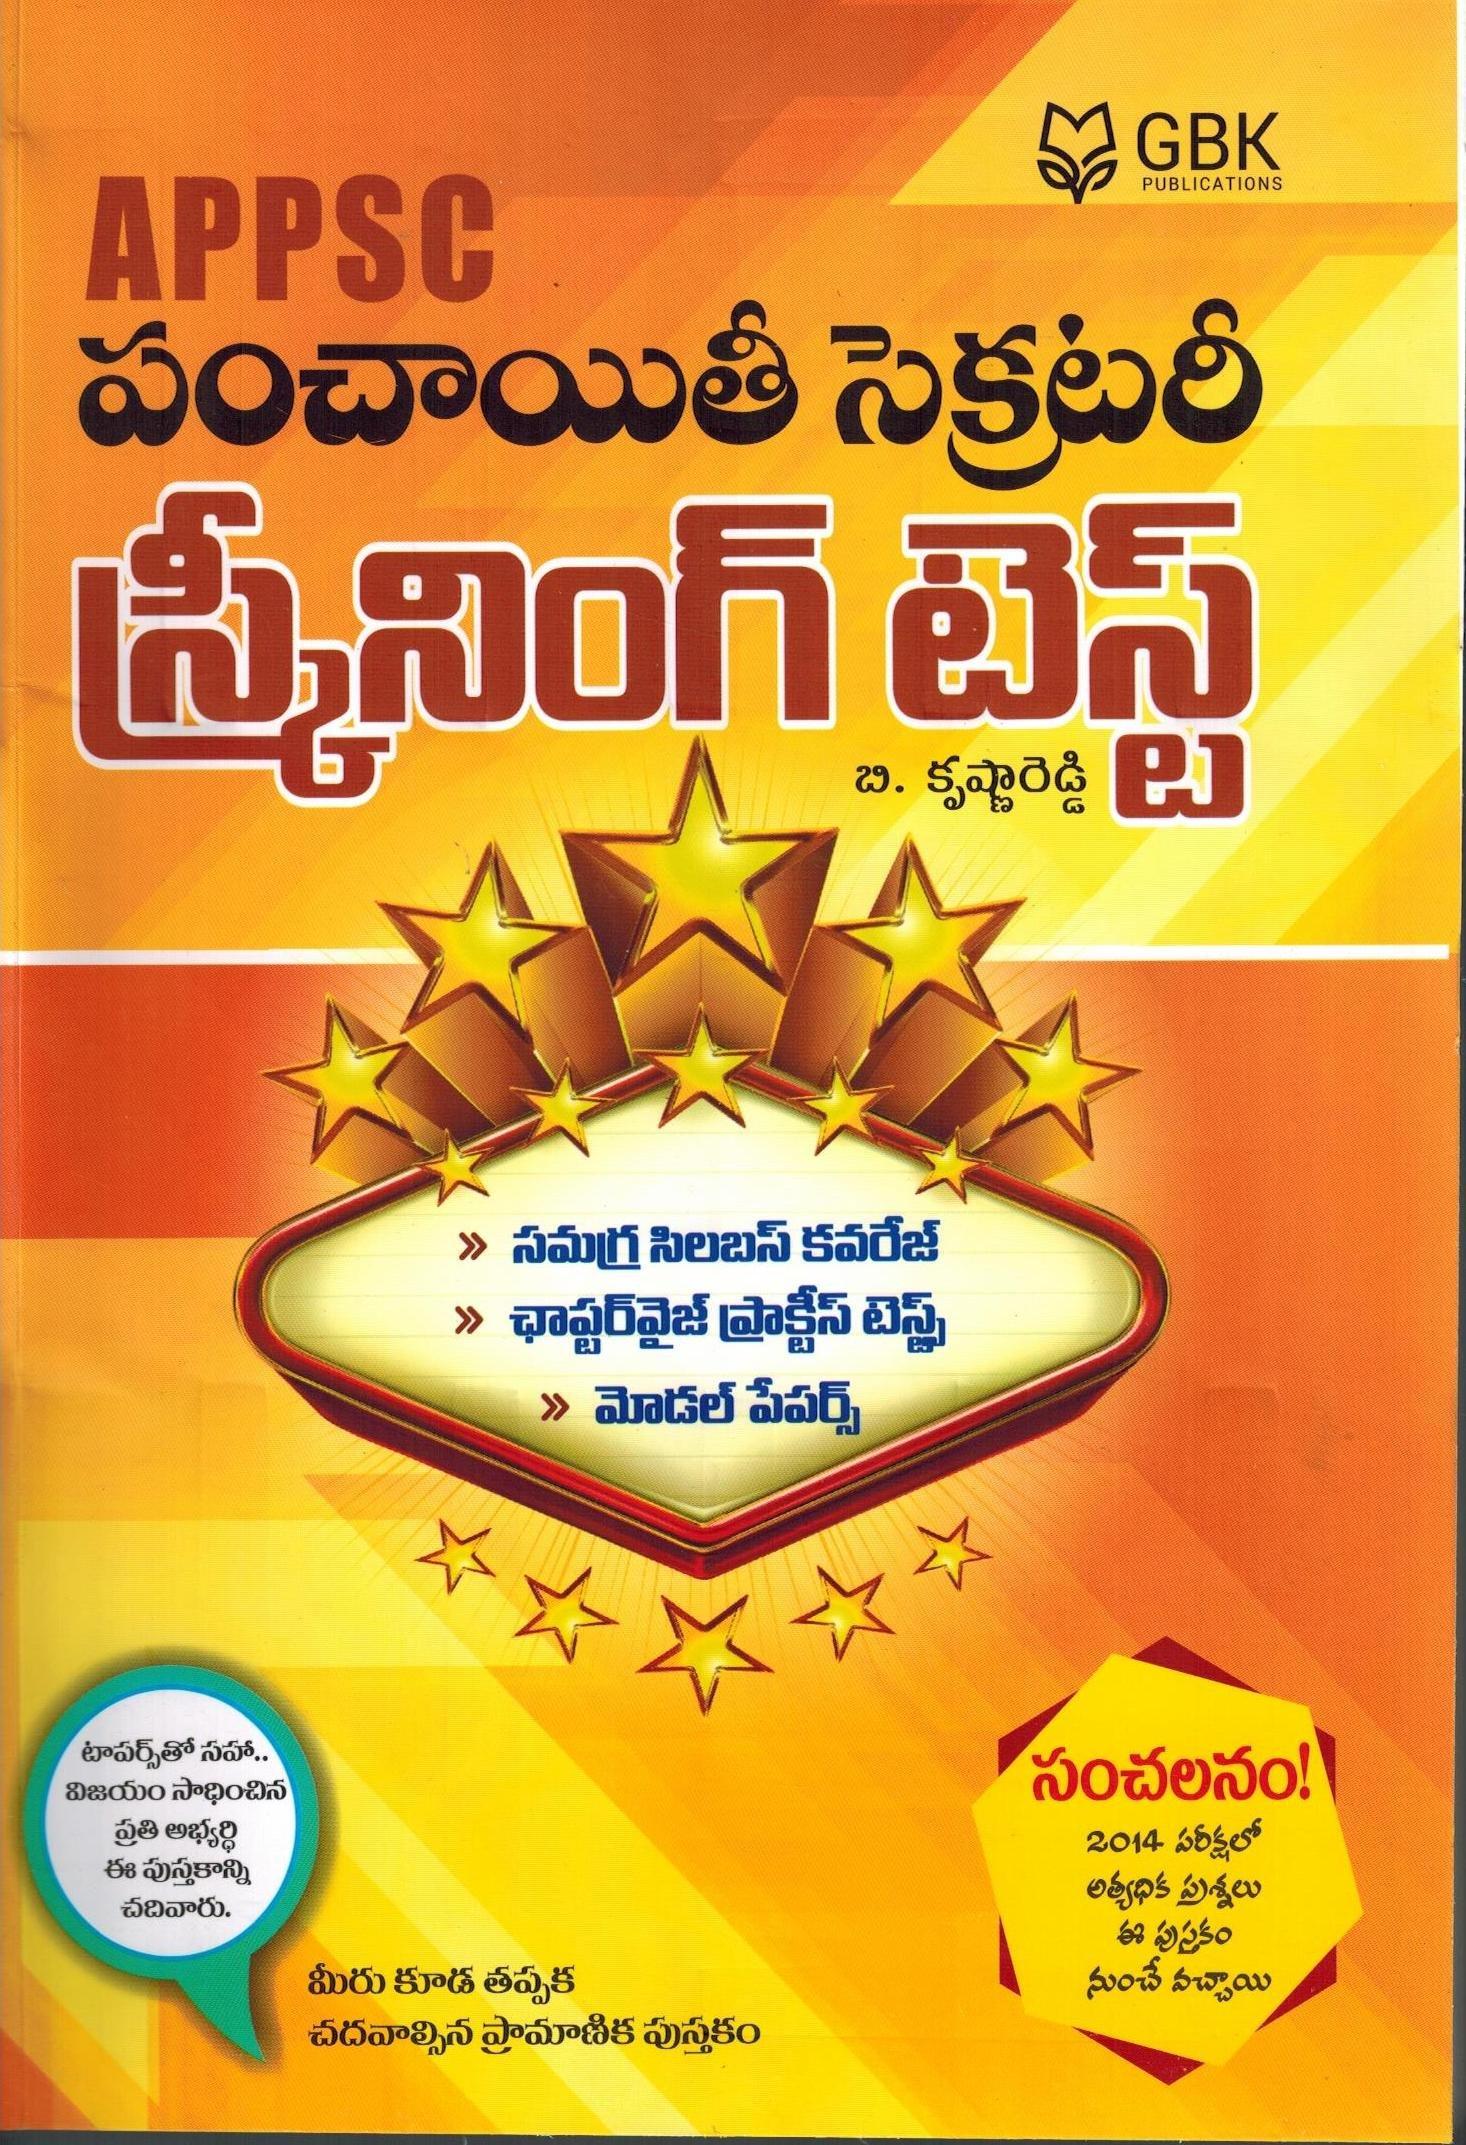 Buy Appsc Panchayati Secretary Screening Test Book Online At Low